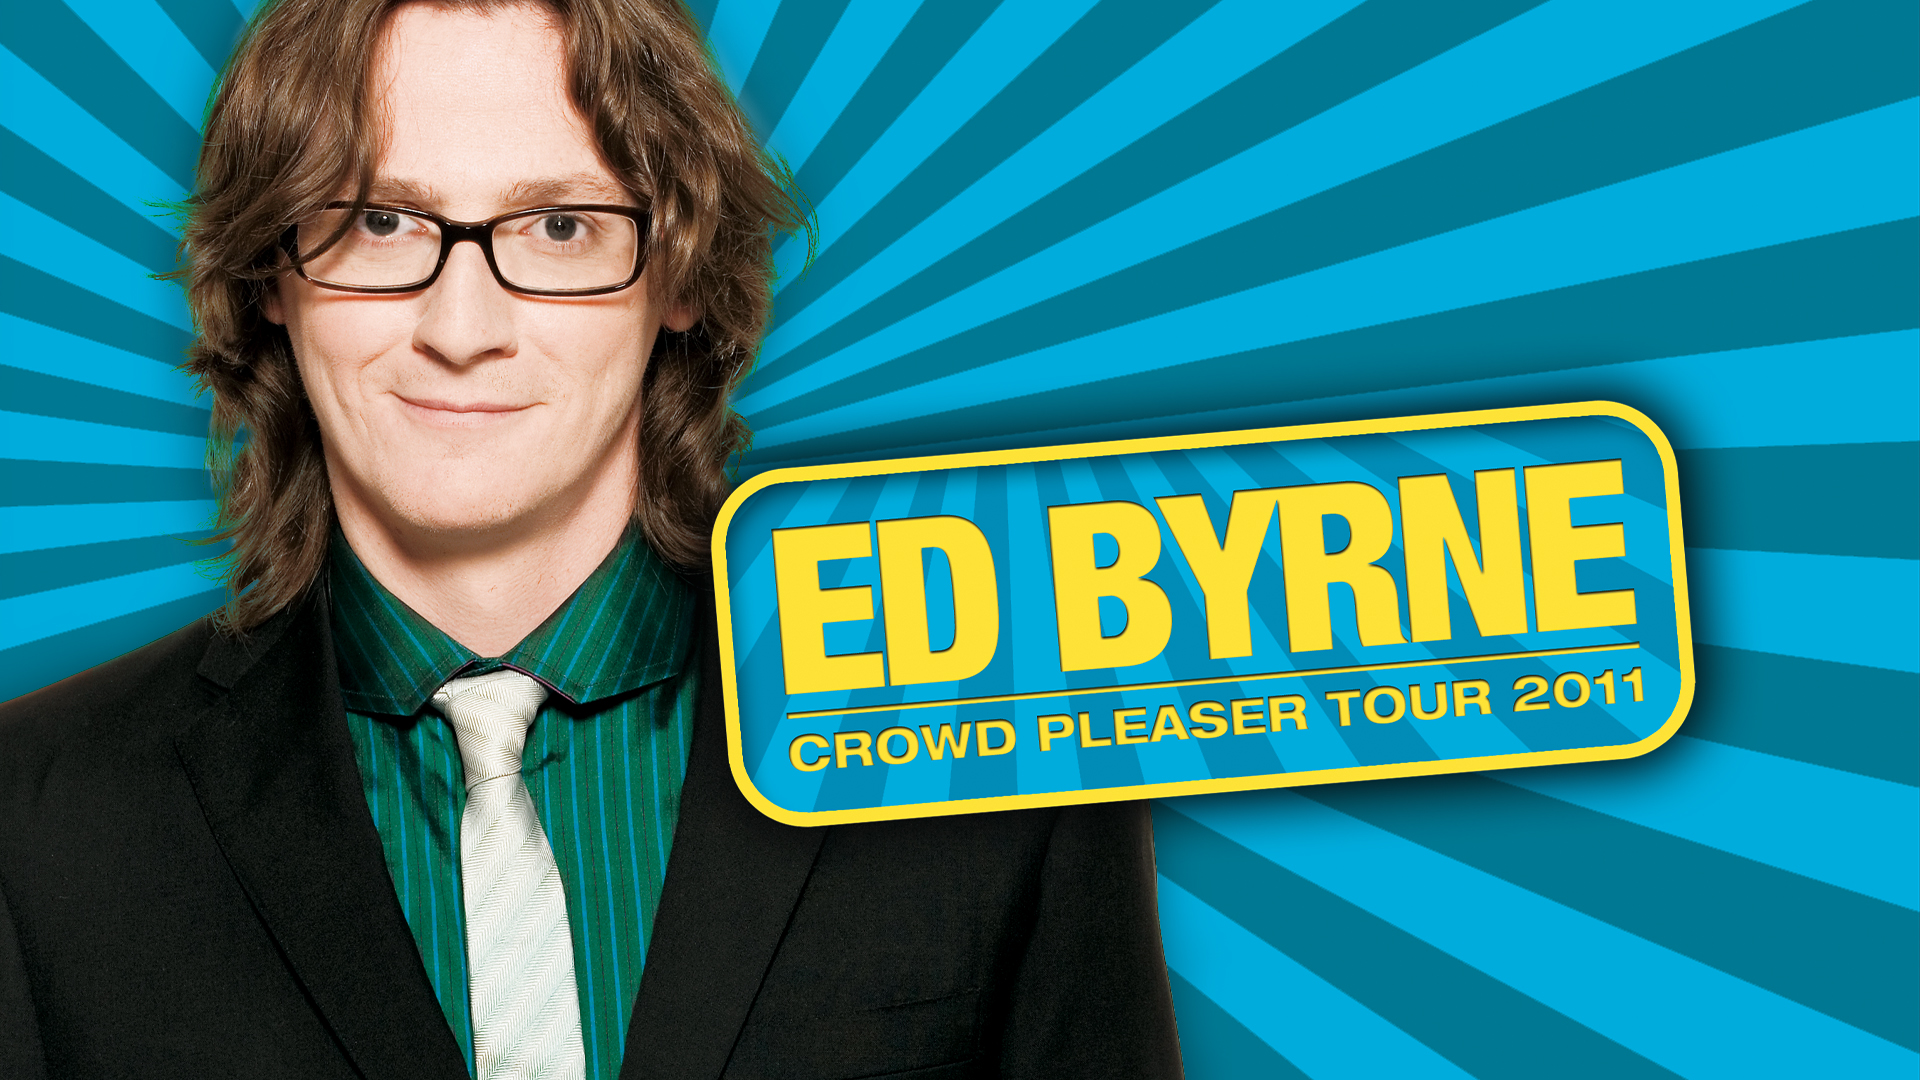 Ed Byrne Crowd Pleaser